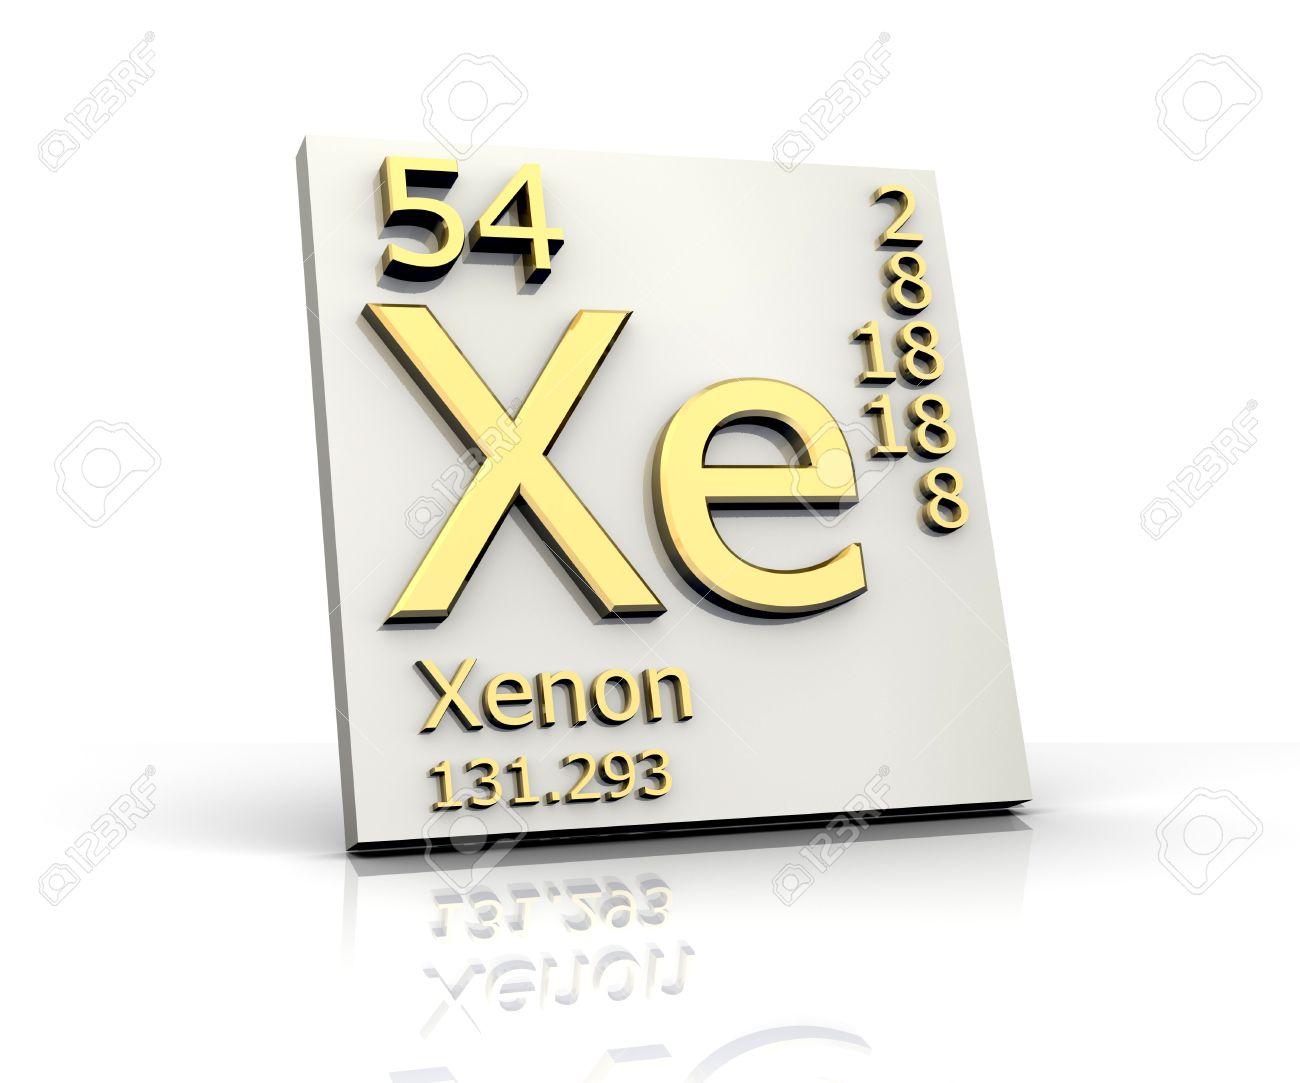 Xenon Periodic Table Xenon form Periodic Table of